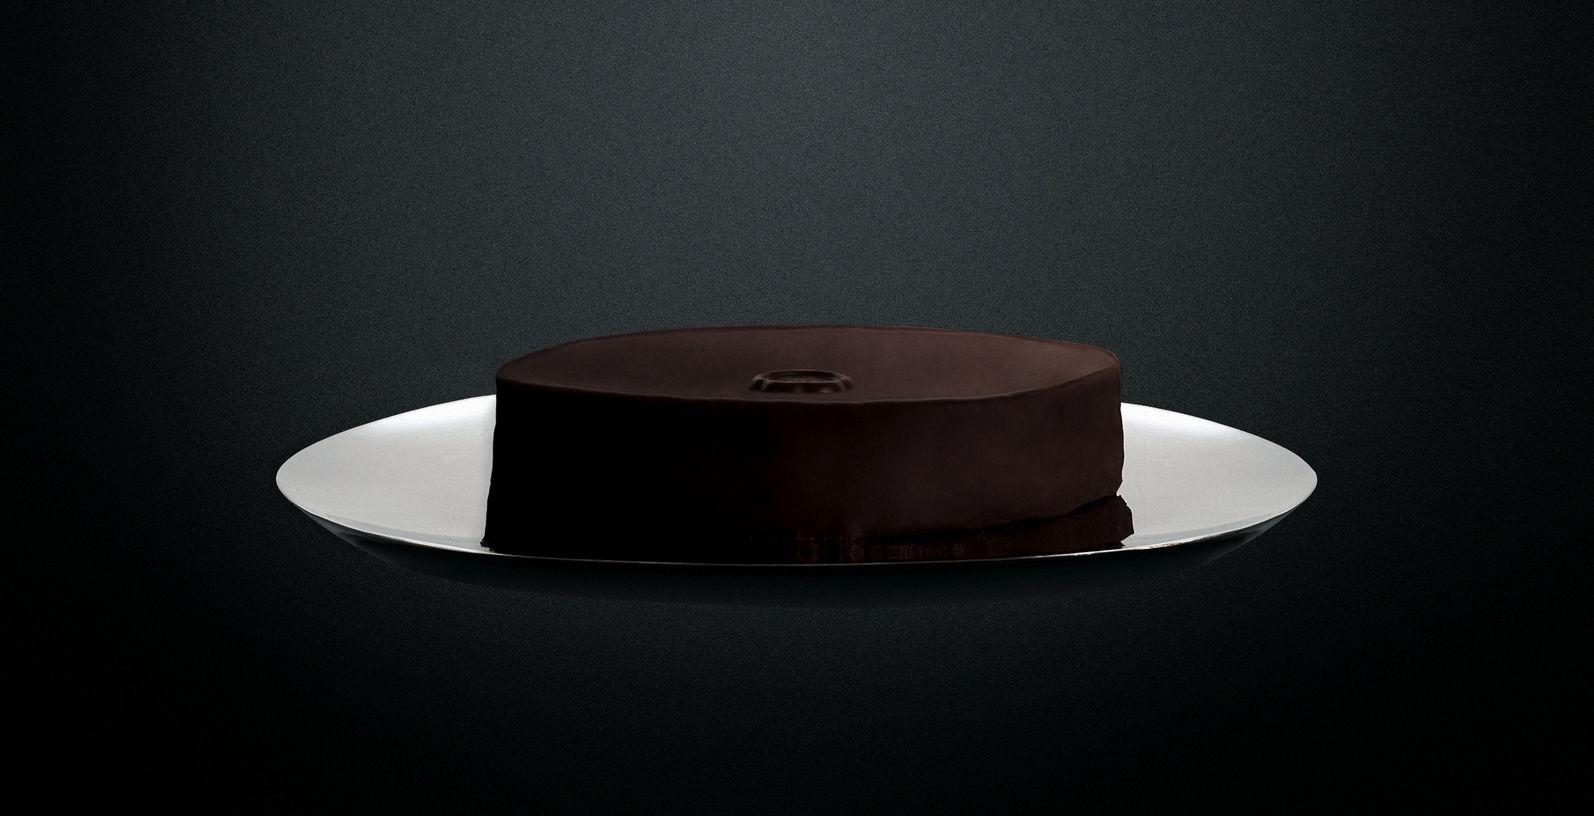 disco volante alessi tablett. Black Bedroom Furniture Sets. Home Design Ideas